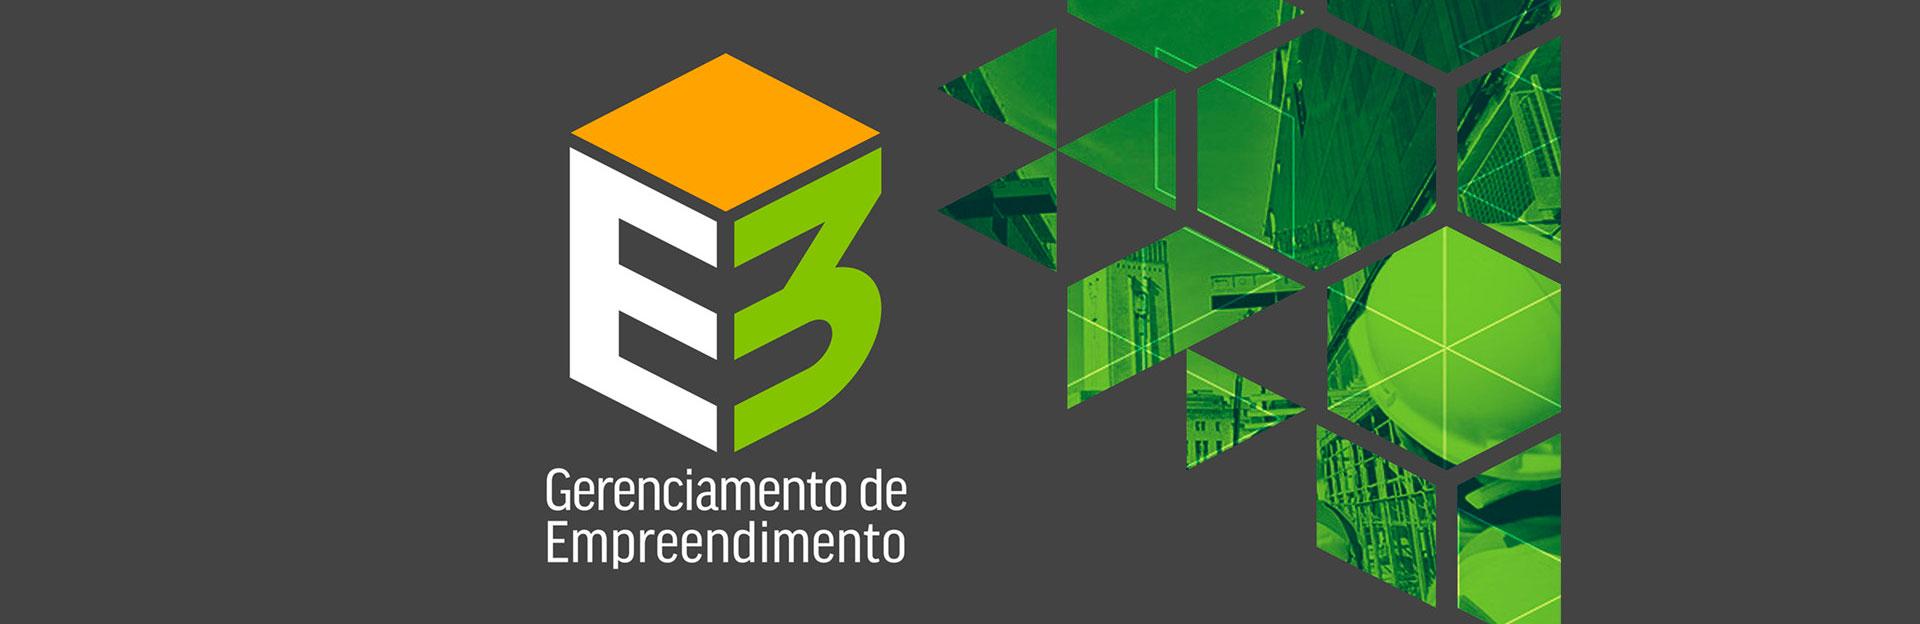 identidade E3 Gerenciamento